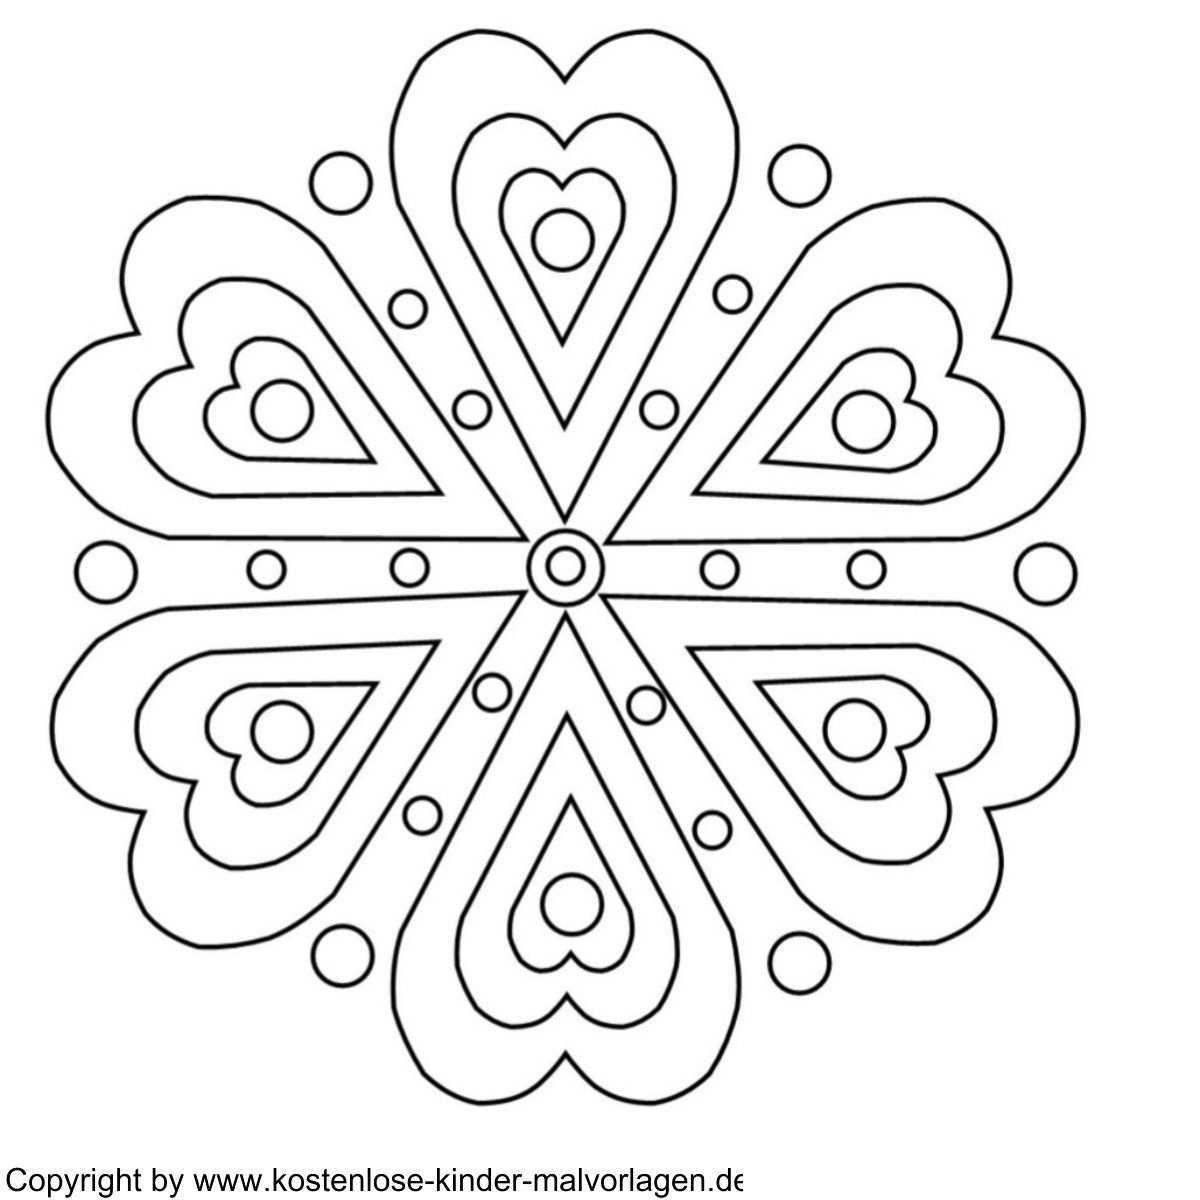 Mandalas Mandala Malvorlagen Kostenlose Malvorlagen Kinder Malvorlagen Ausmalbilder Mandala Ausmalen Mandala Malvorlagen